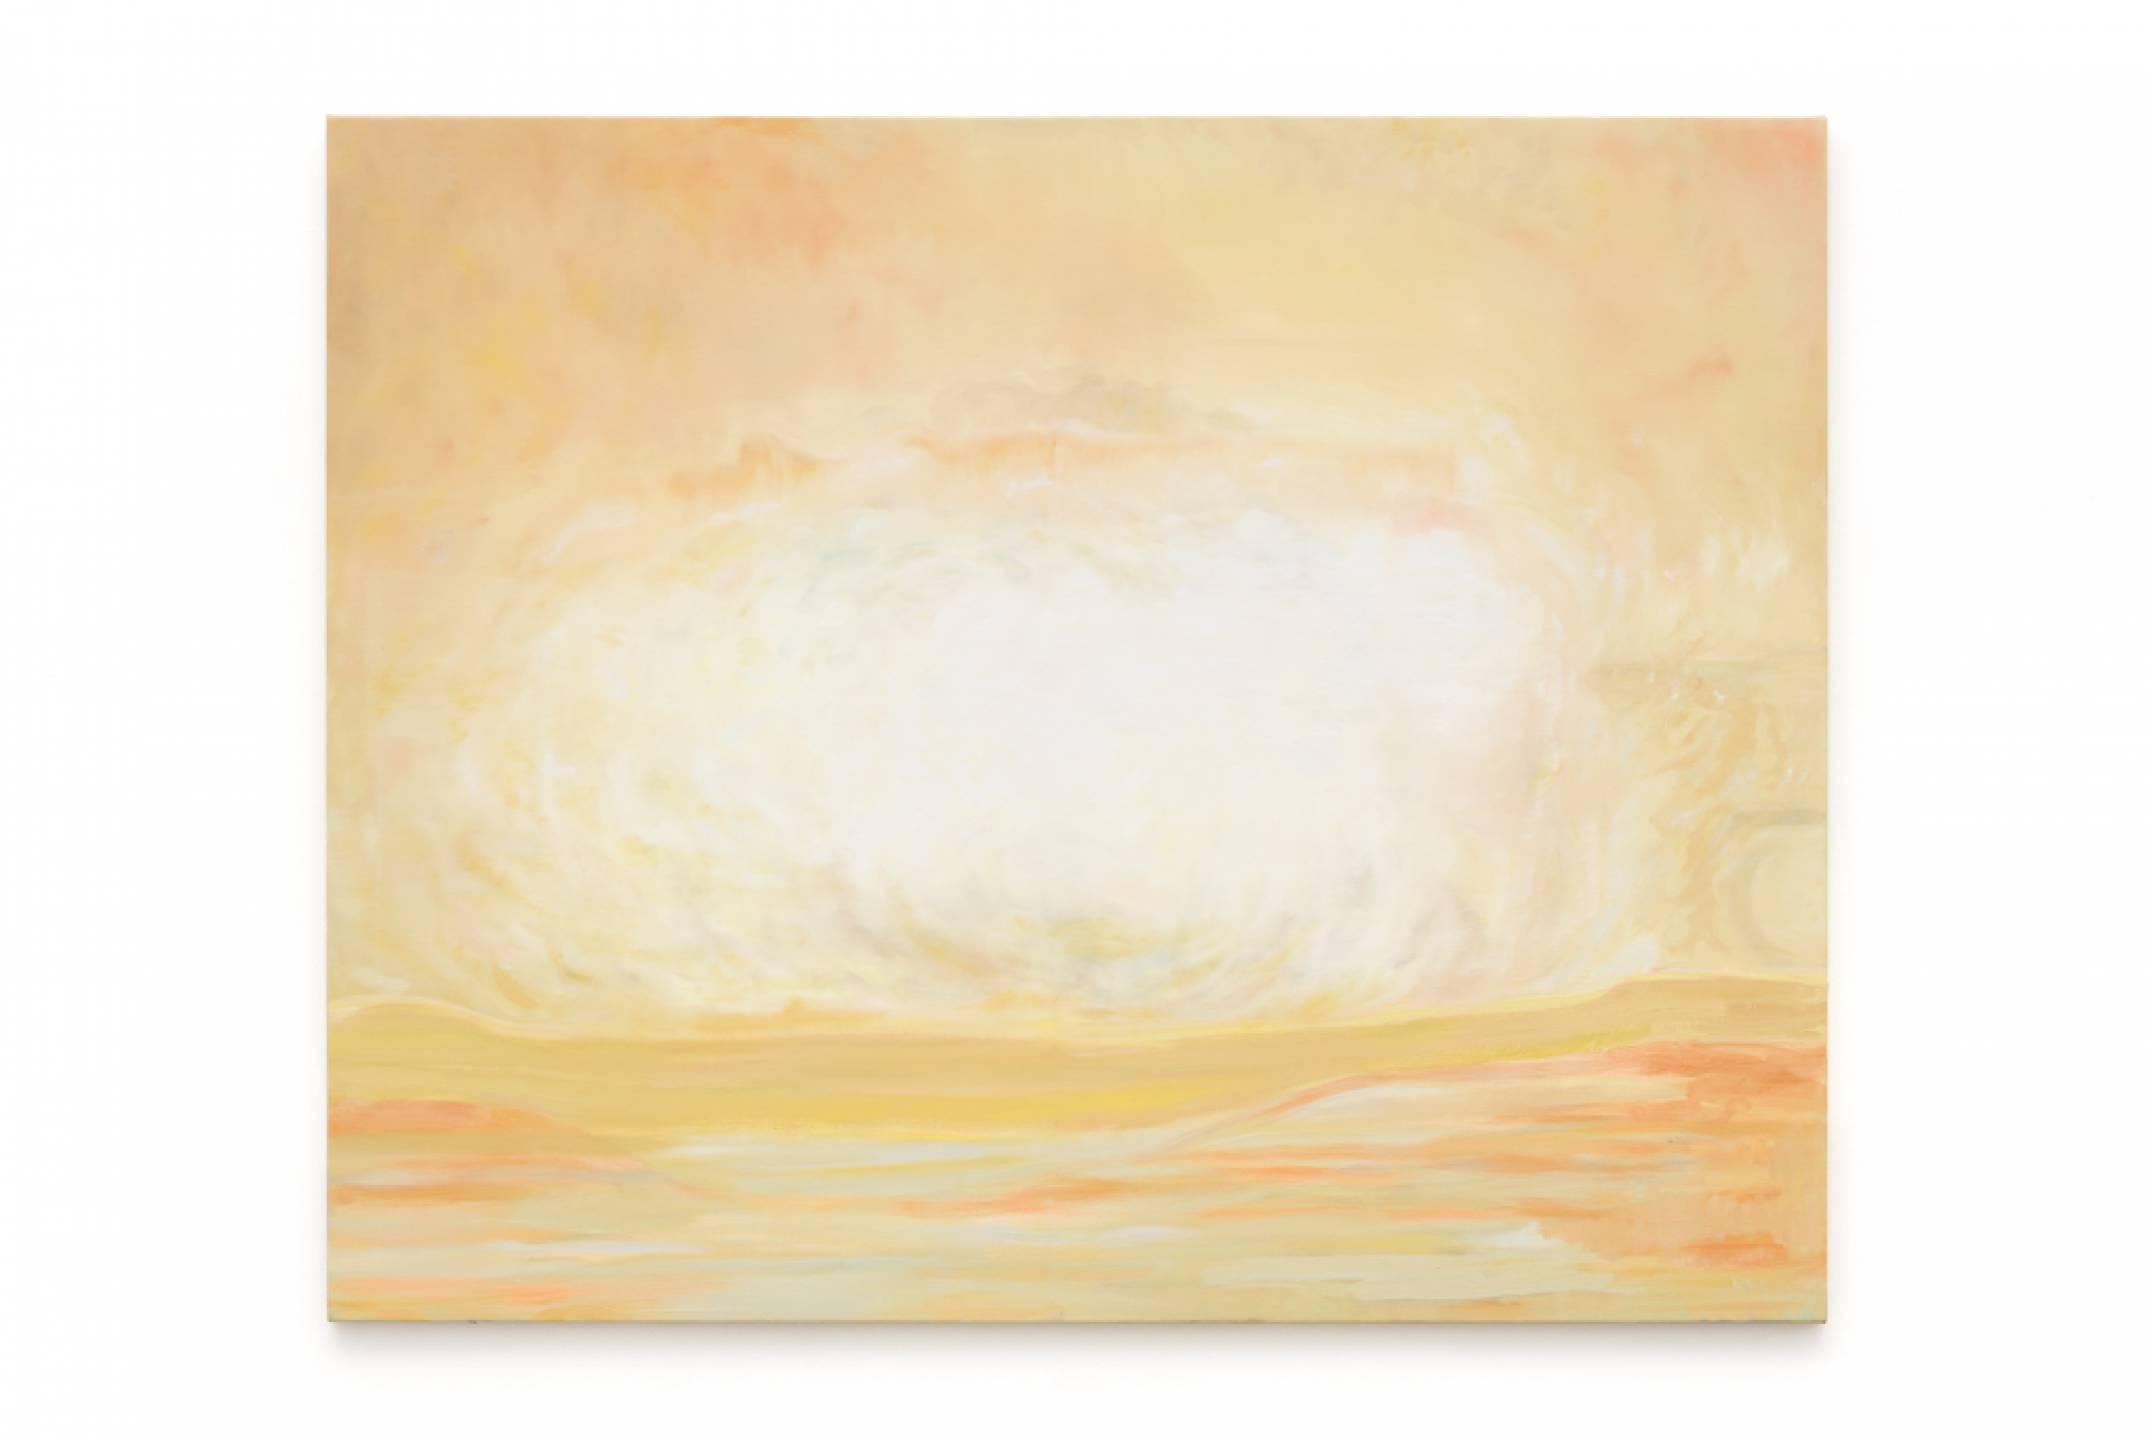 Marina Perez Simão,<em>untitled</em>, 2017,oil on canvas, 122 × 152 cm - Mendes Wood DM